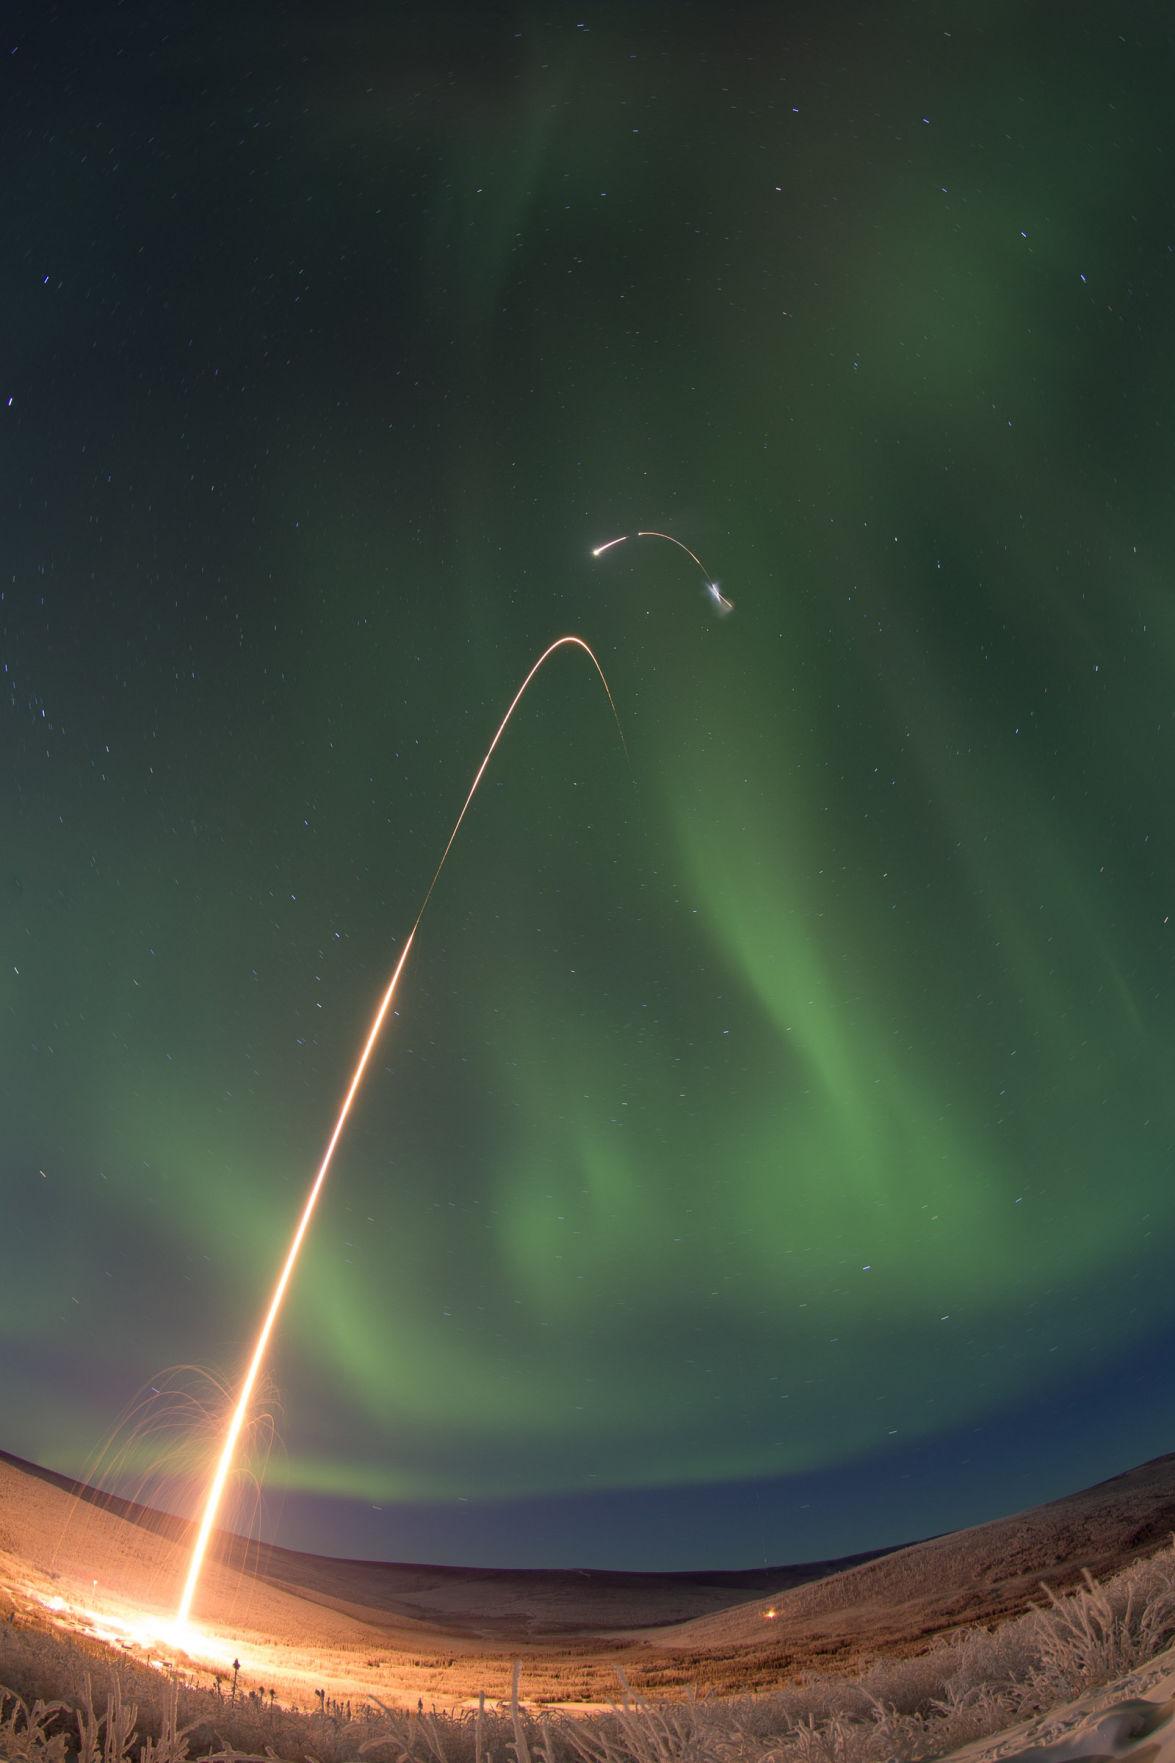 January 2015 rocket launch